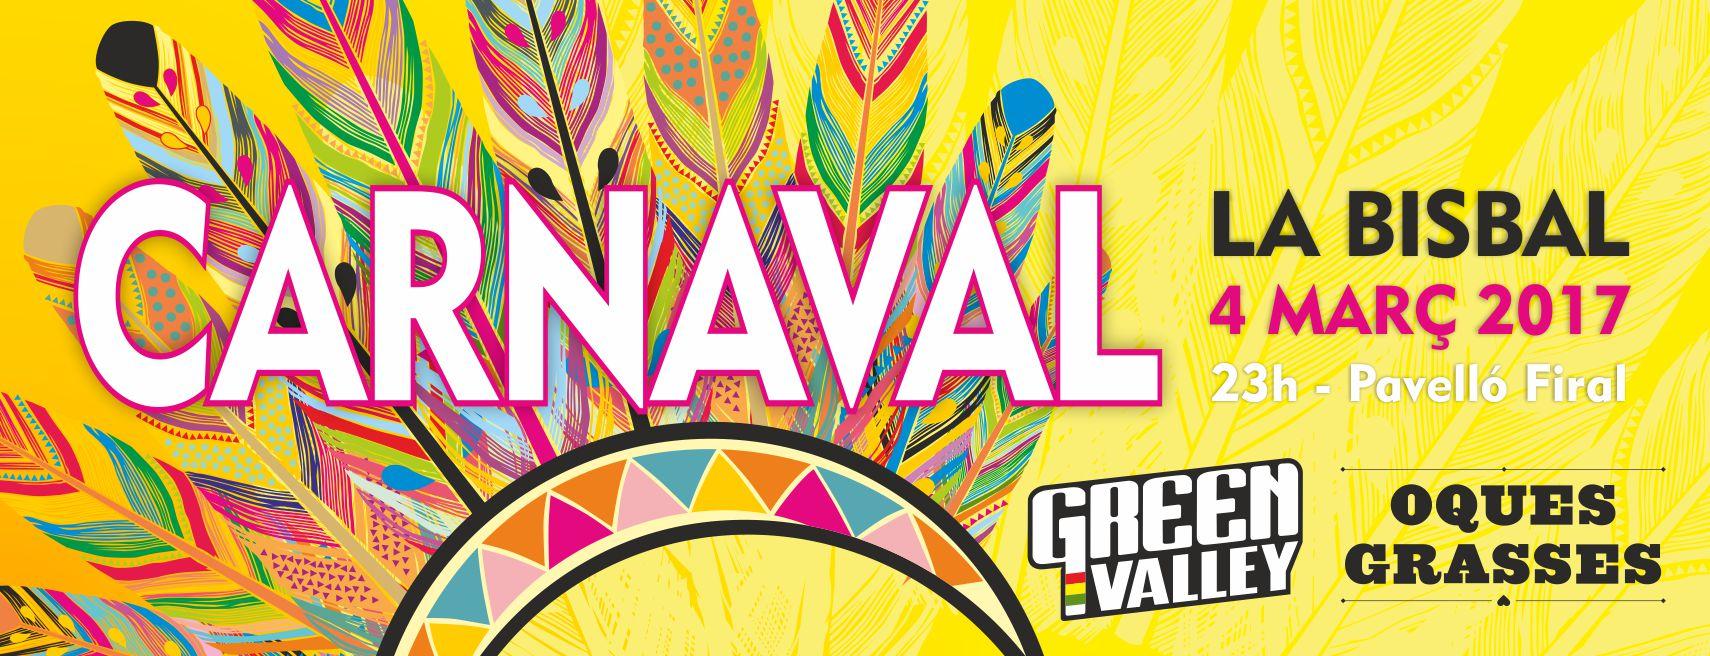 Cartell Festa Carnaval la Bisbal 2017